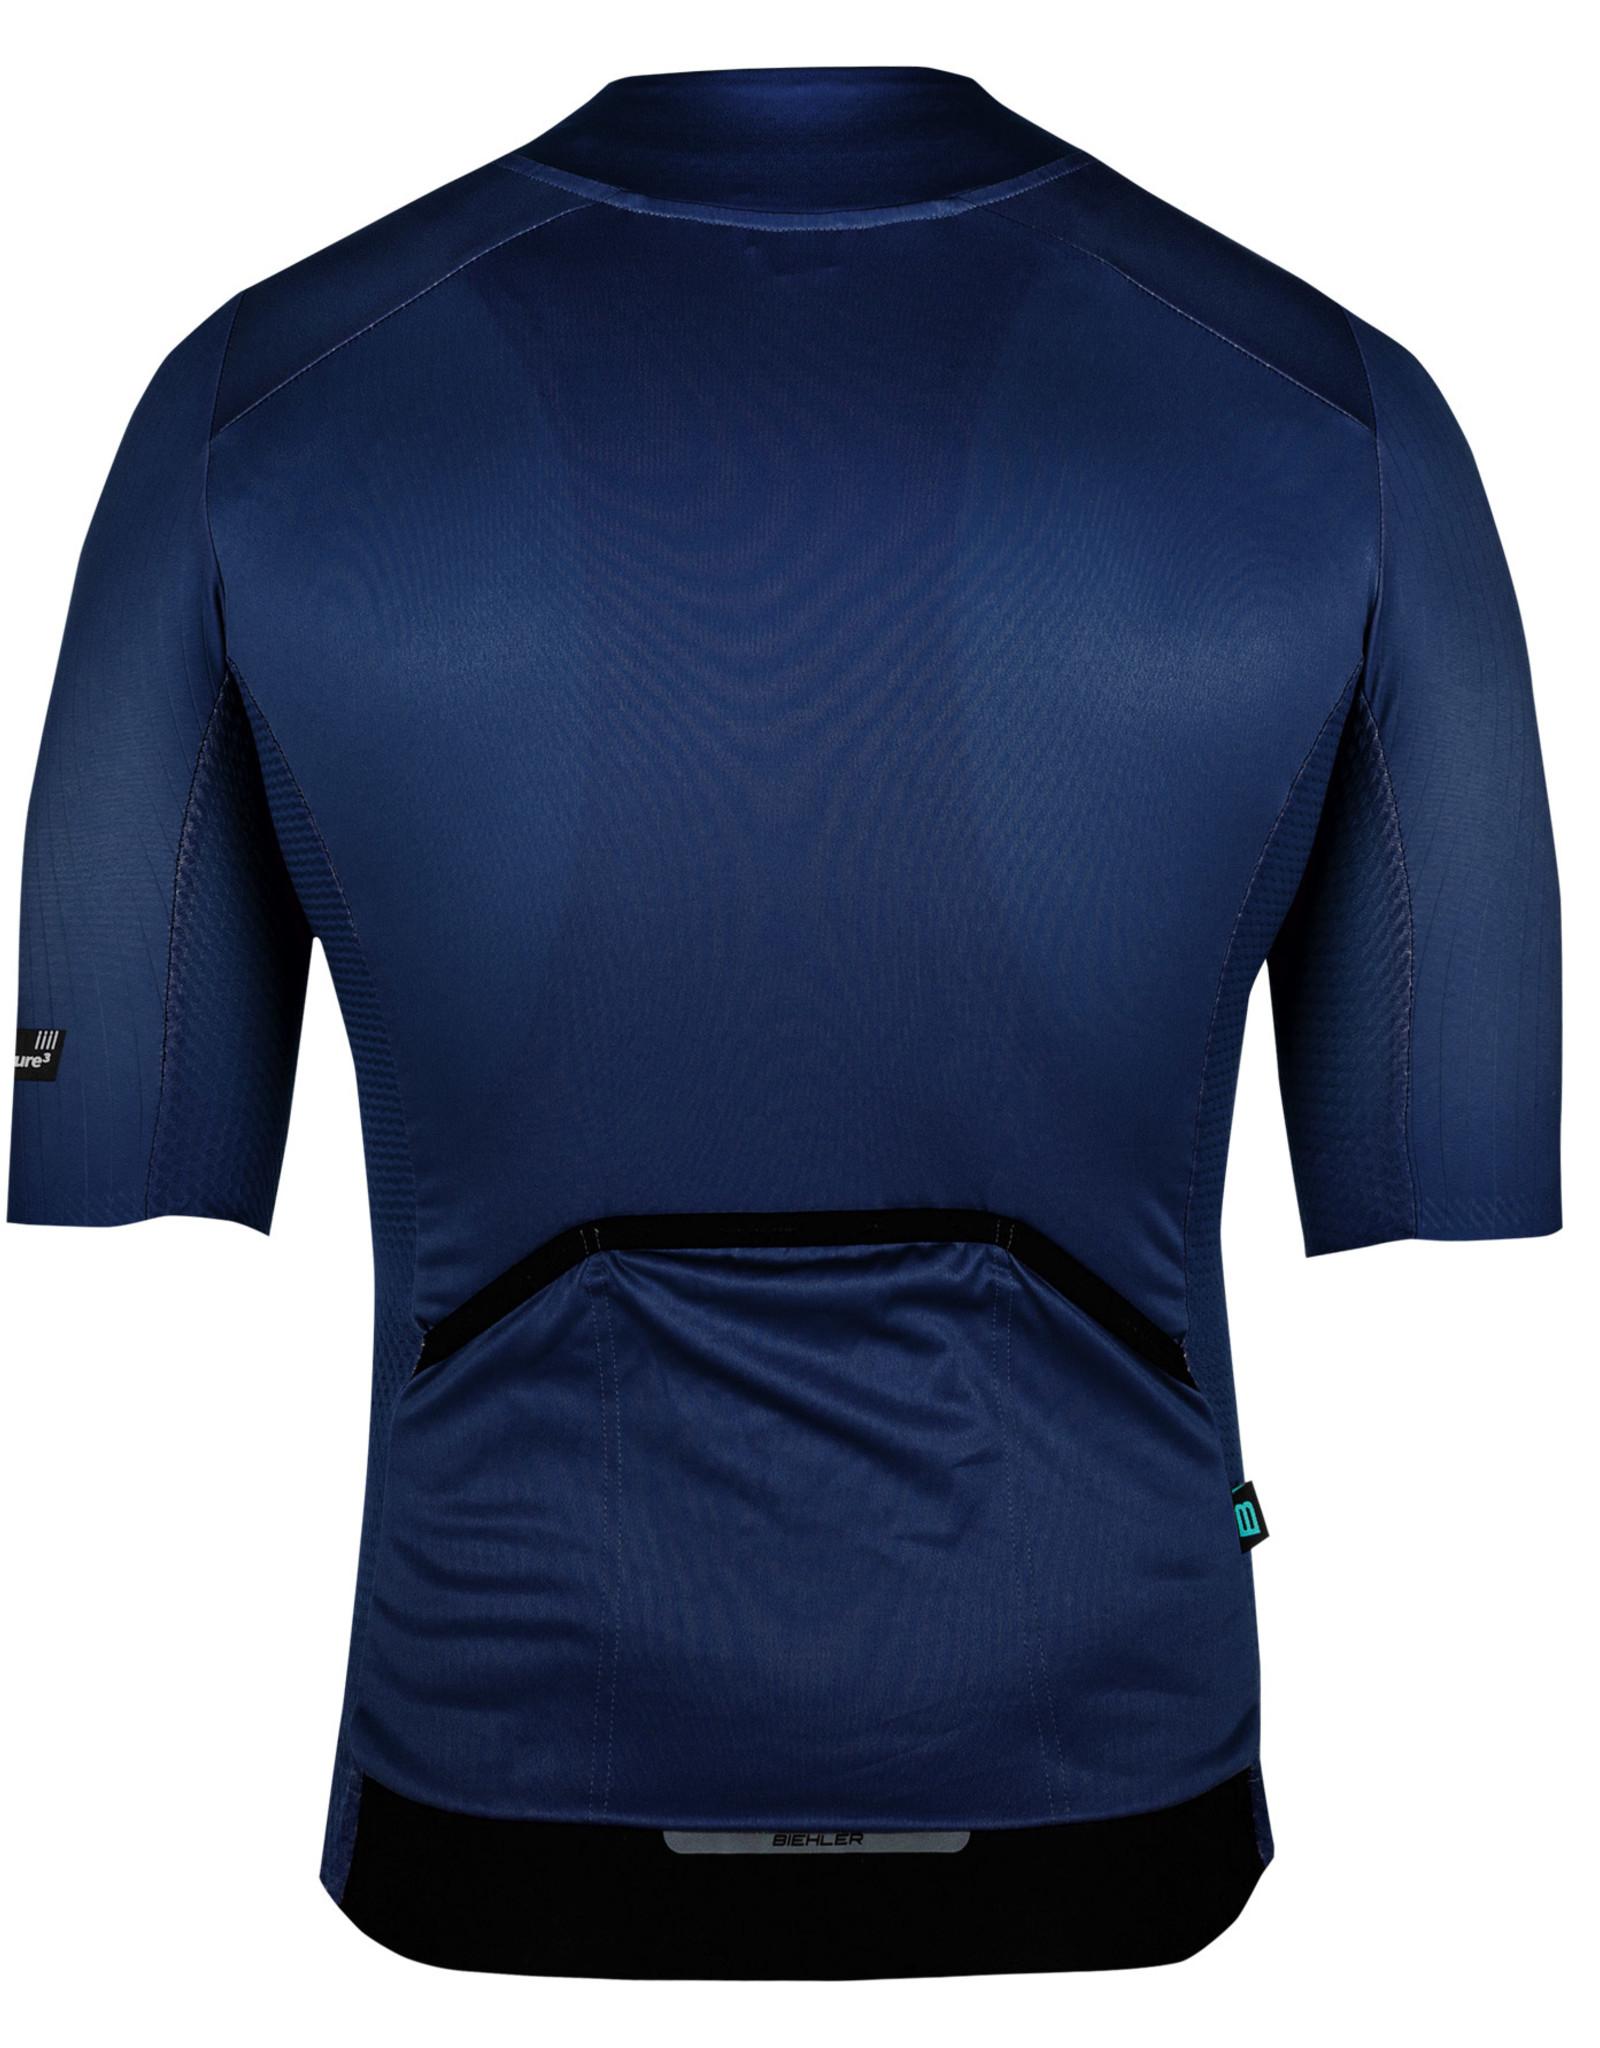 Biehler Signature jersey night blue